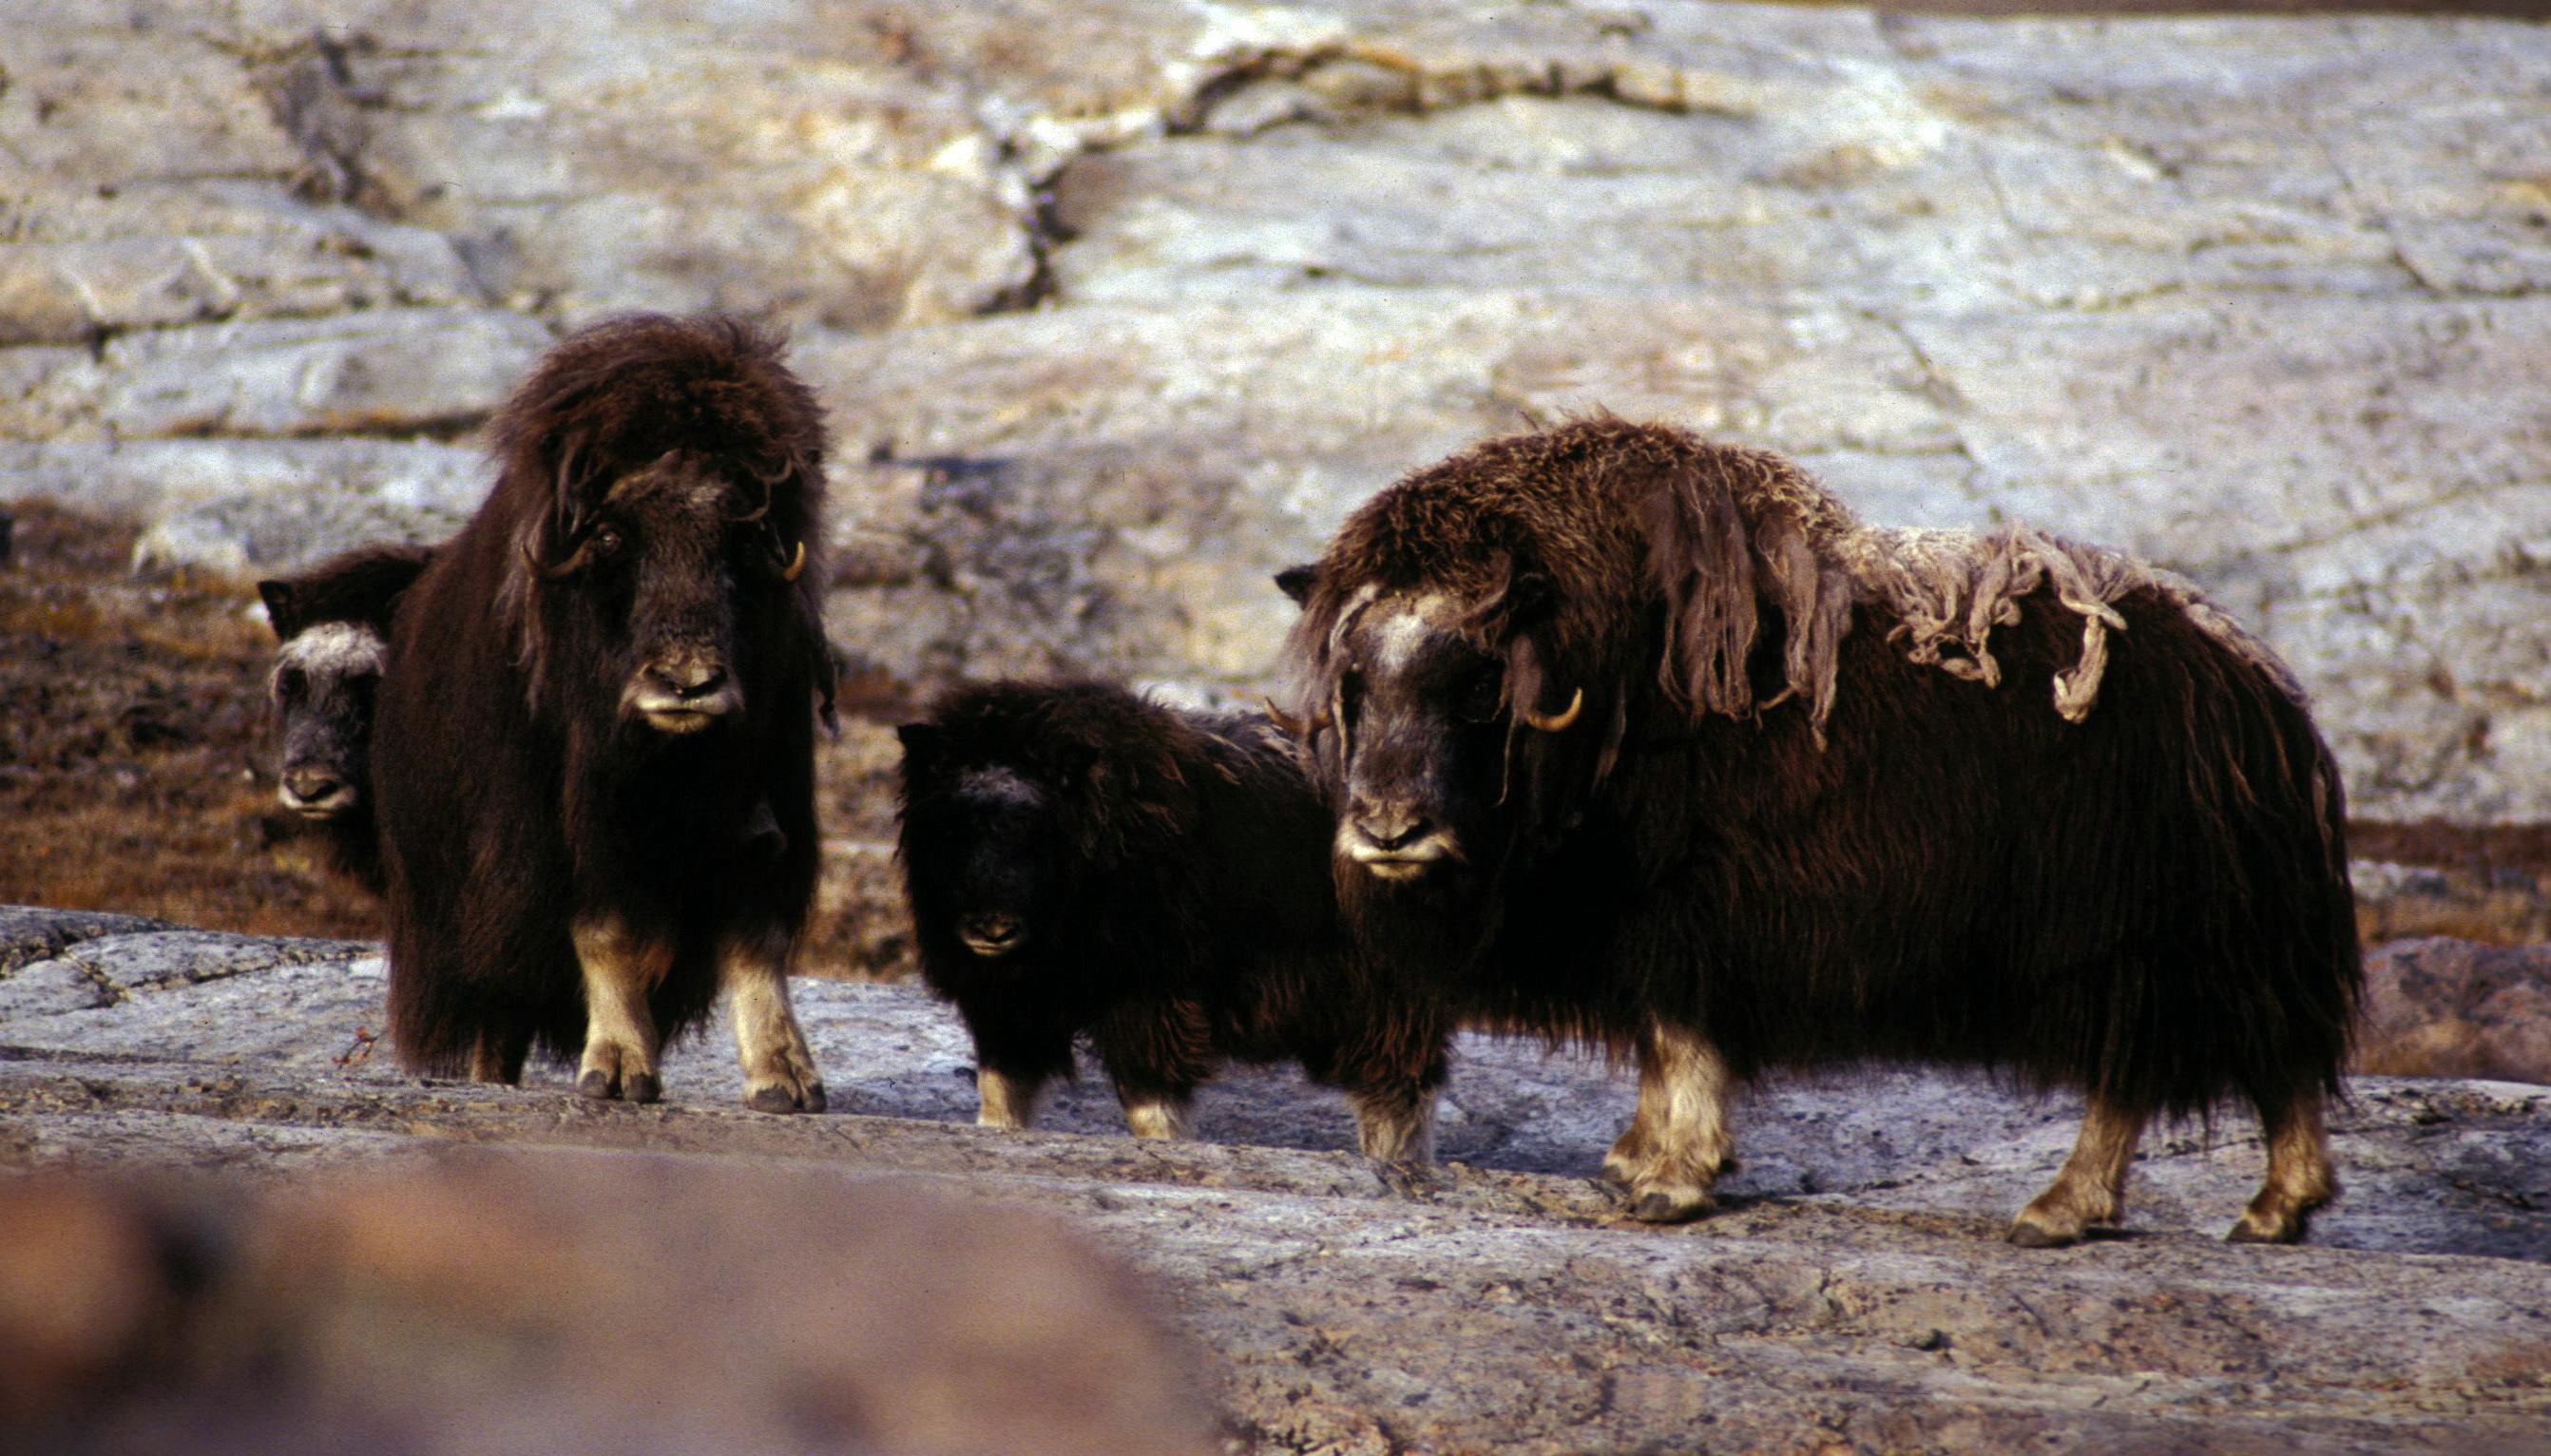 Taiga forest animals